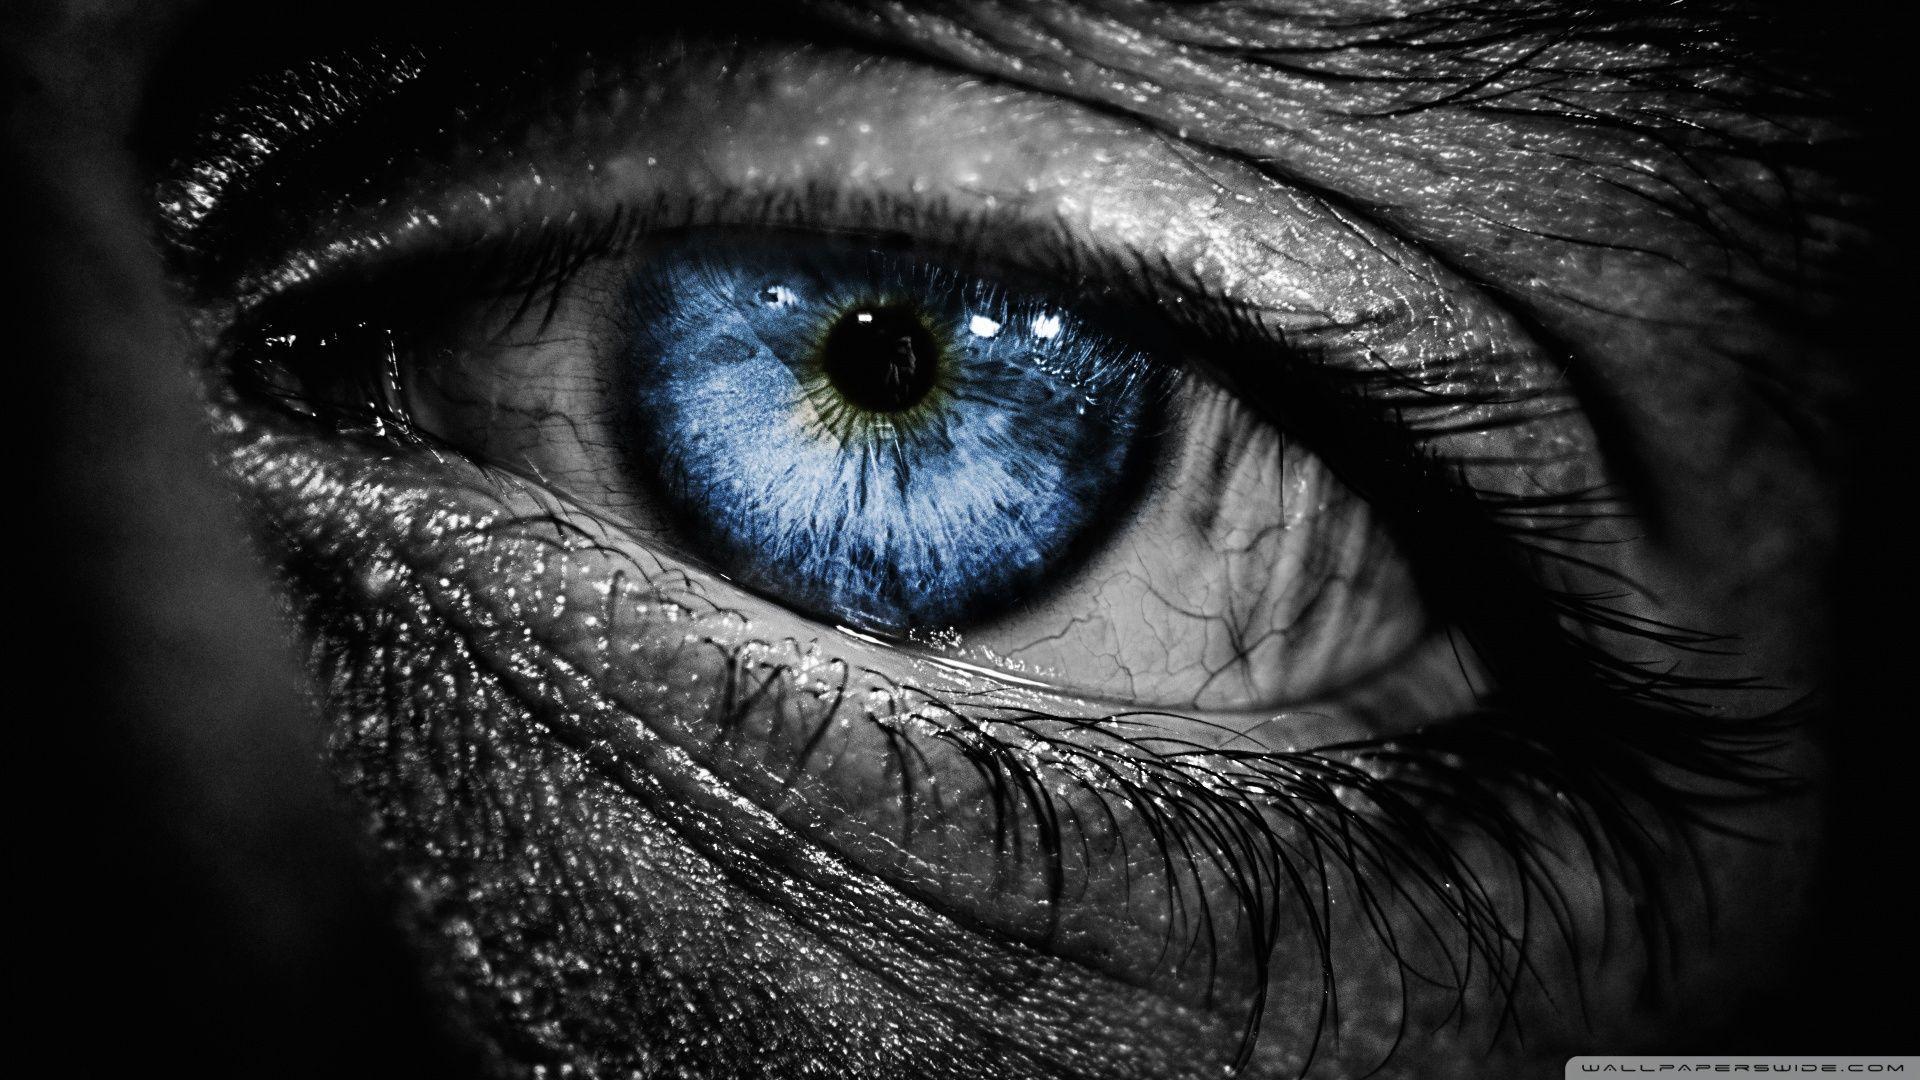 Blue Eye Hd Wallpapers Wallpaper Cave